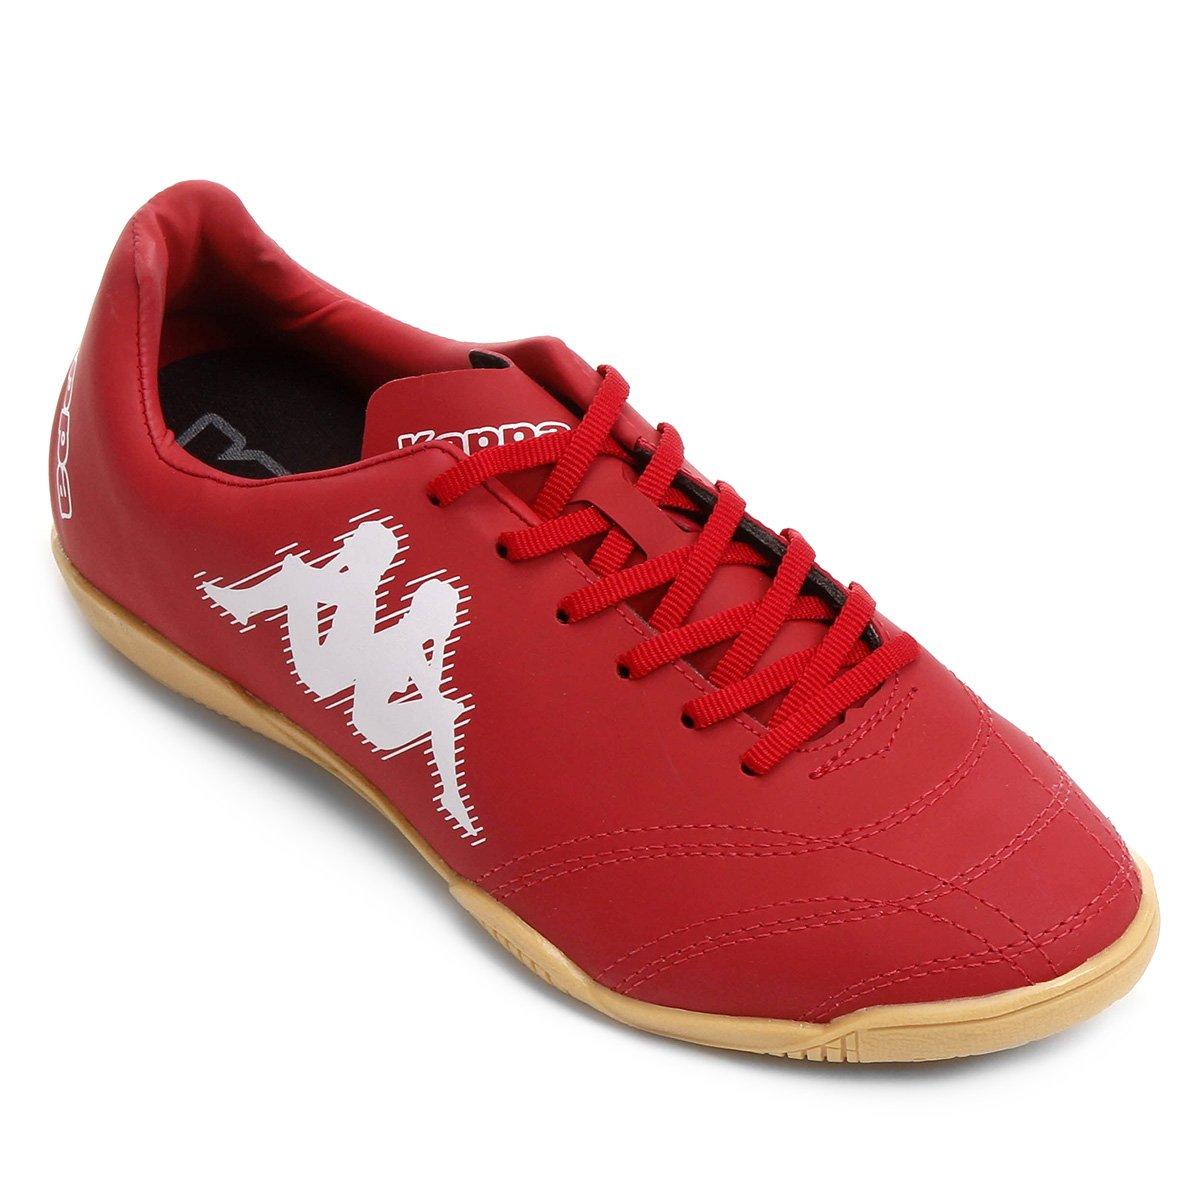 fd70f739b Chuteira Futsal Kappa Piave - Vermelho e Branco